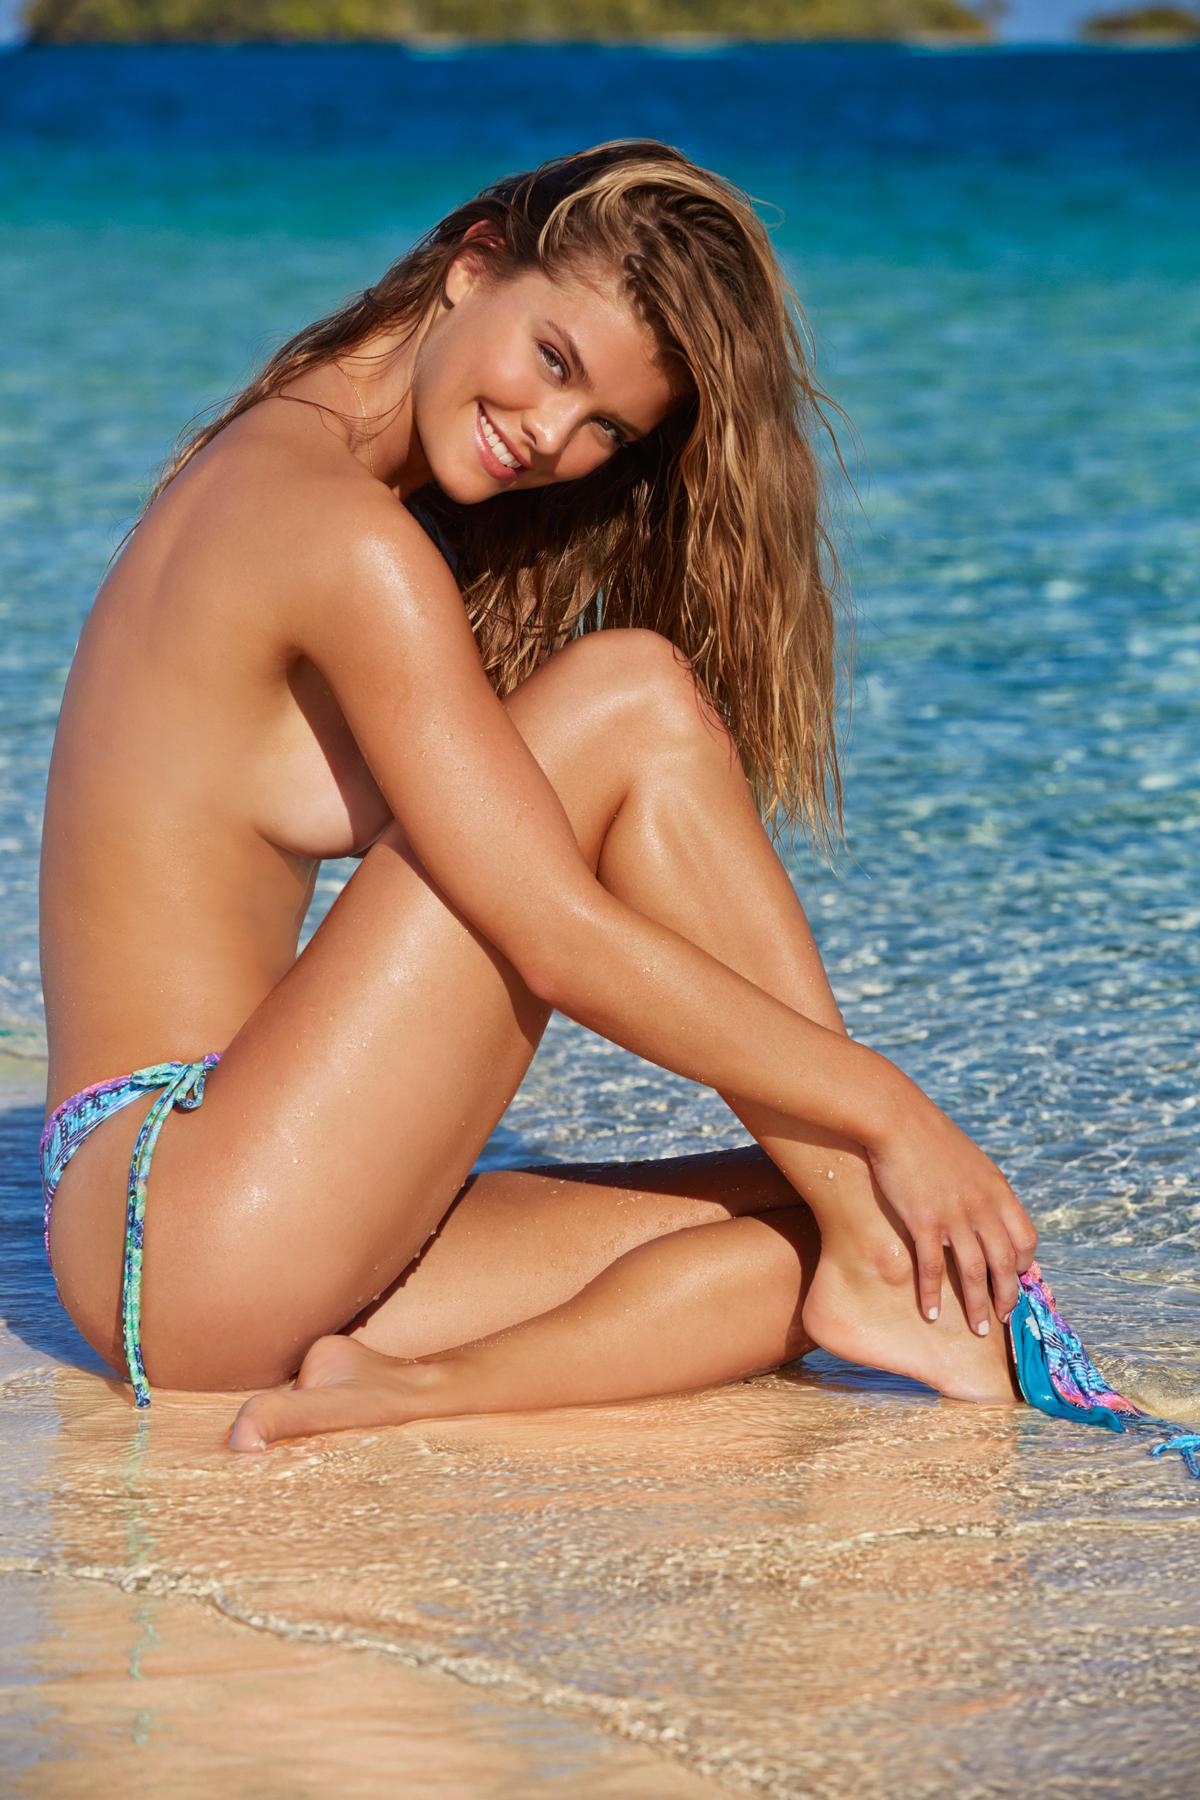 nude brunette woman sex selfie